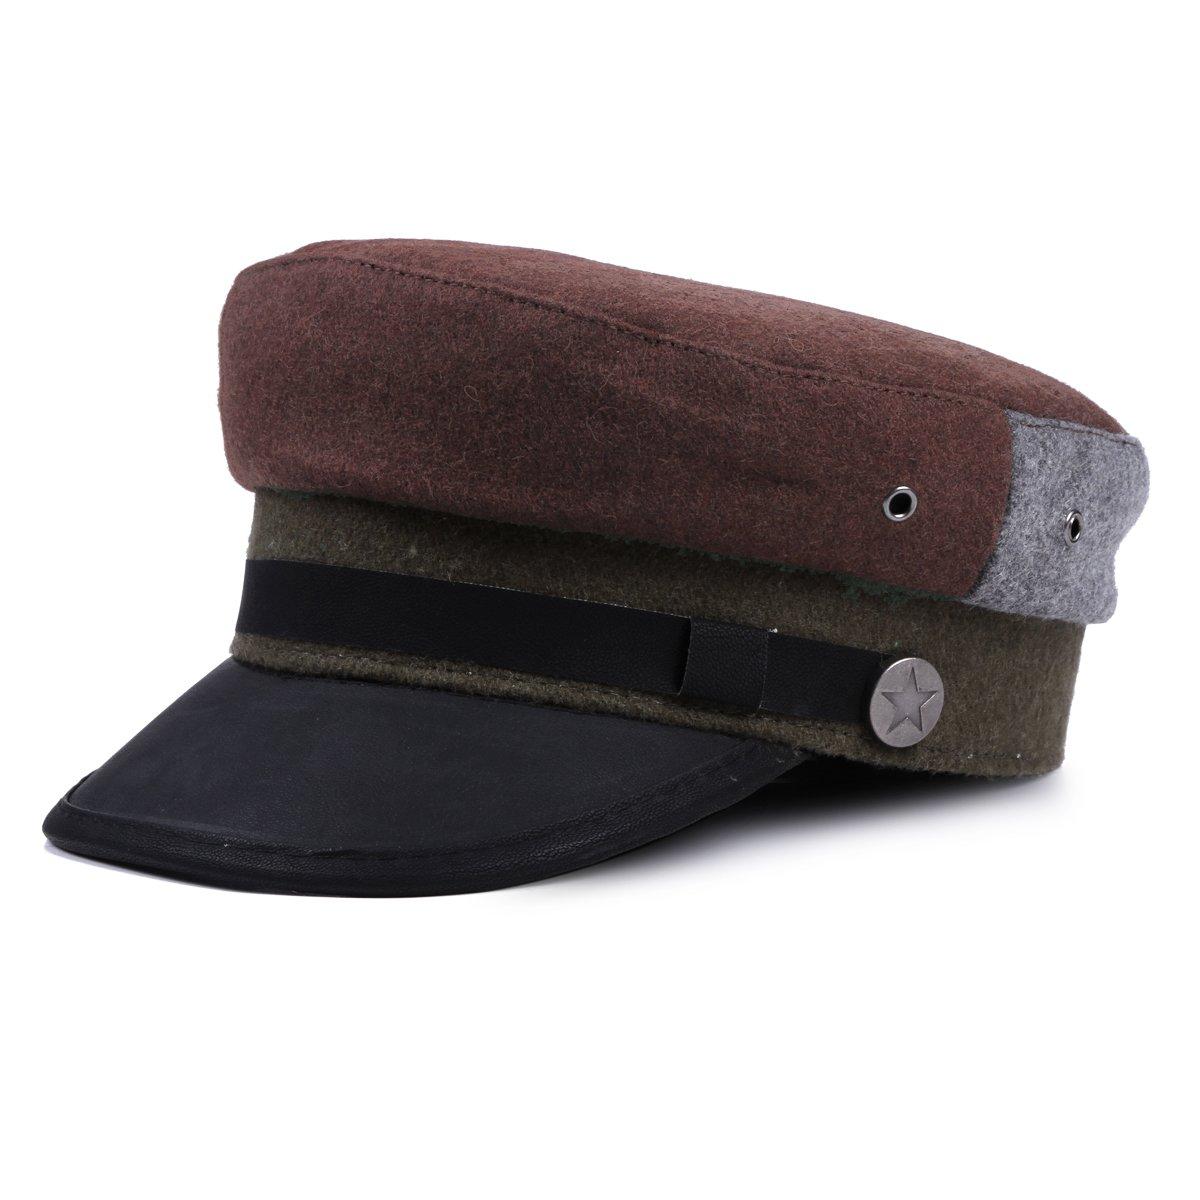 Damara Woolen Visor Newsboy Hats Beret Caps